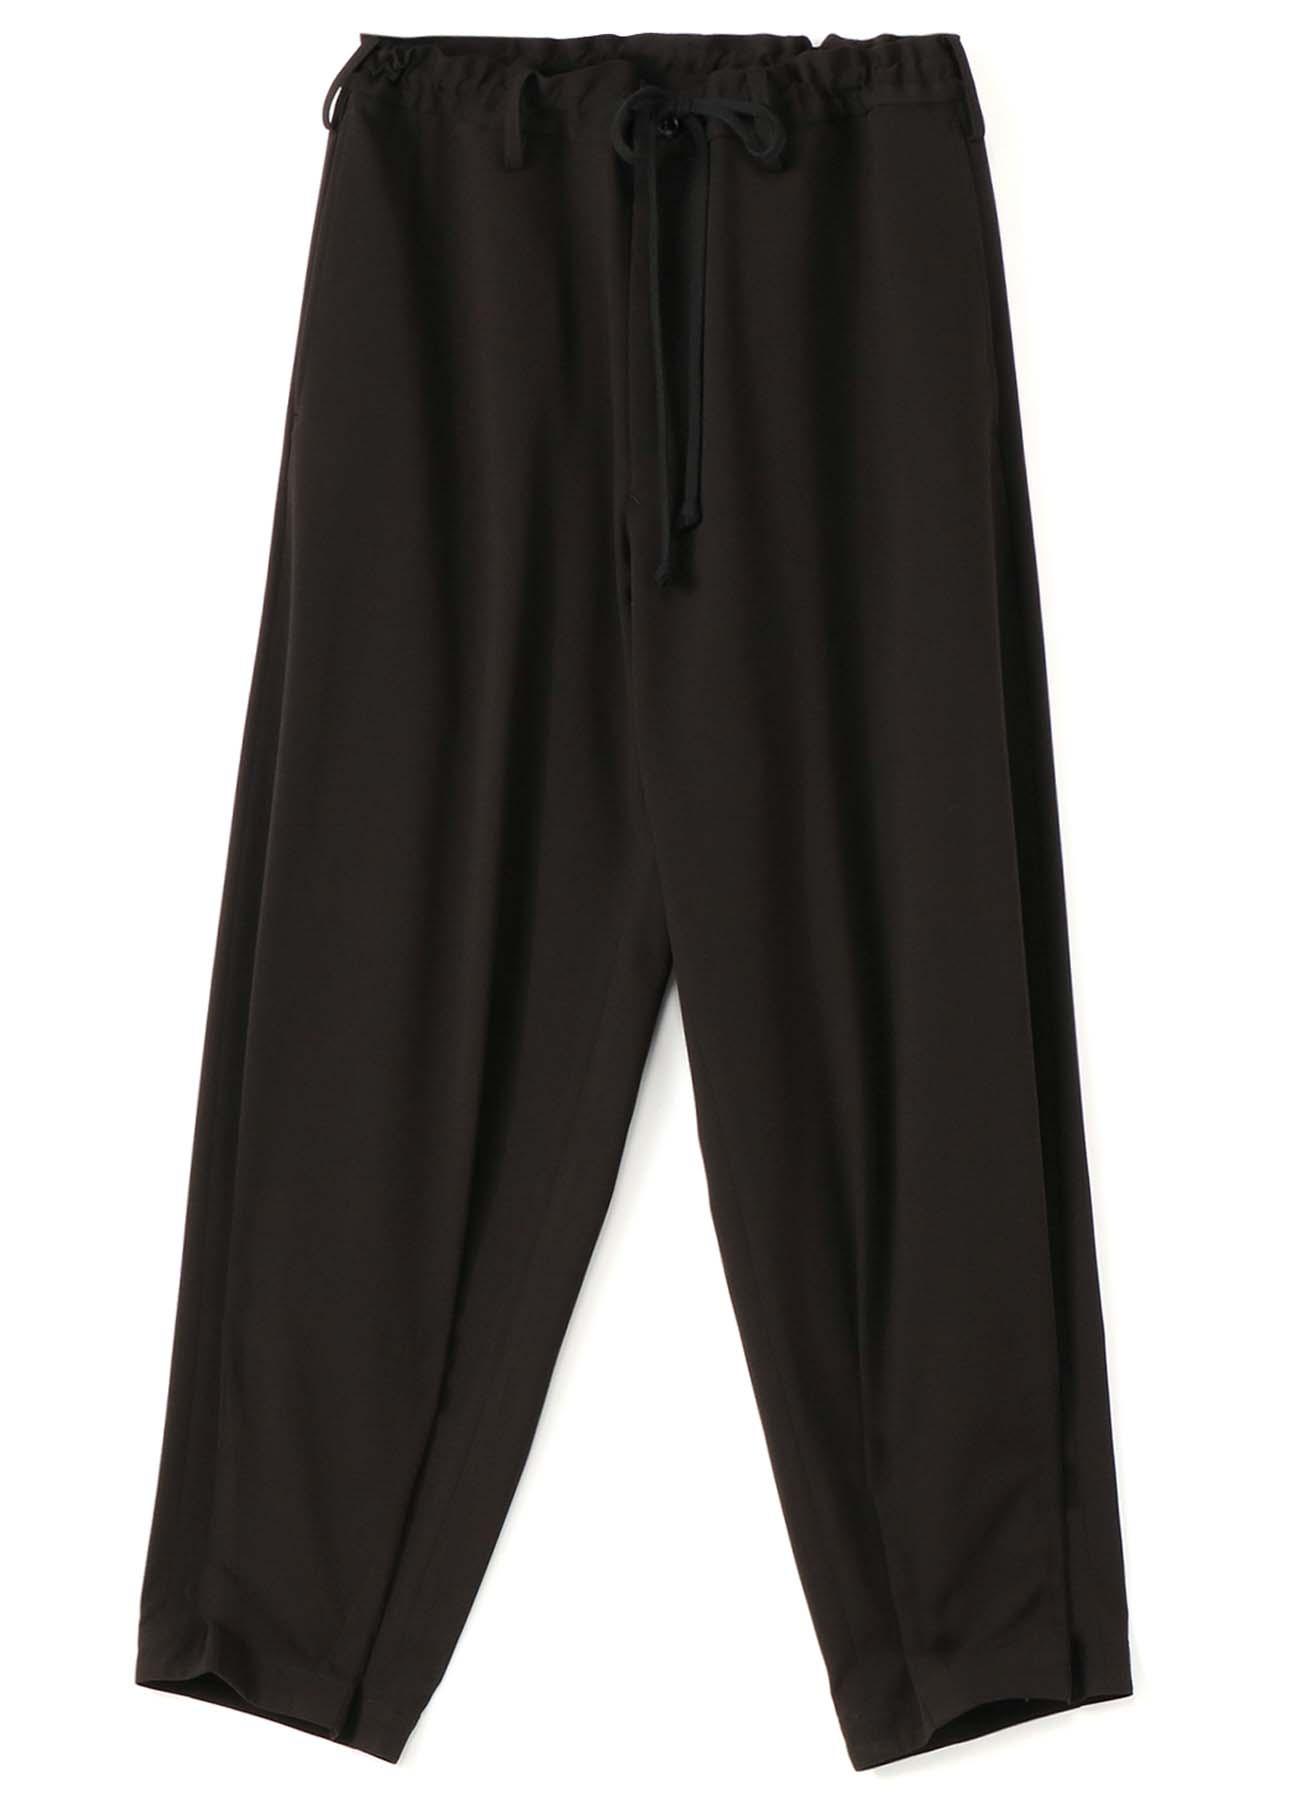 Pe/Rayon Gabardine Stretch Hem Darts Medium-thin String Pants